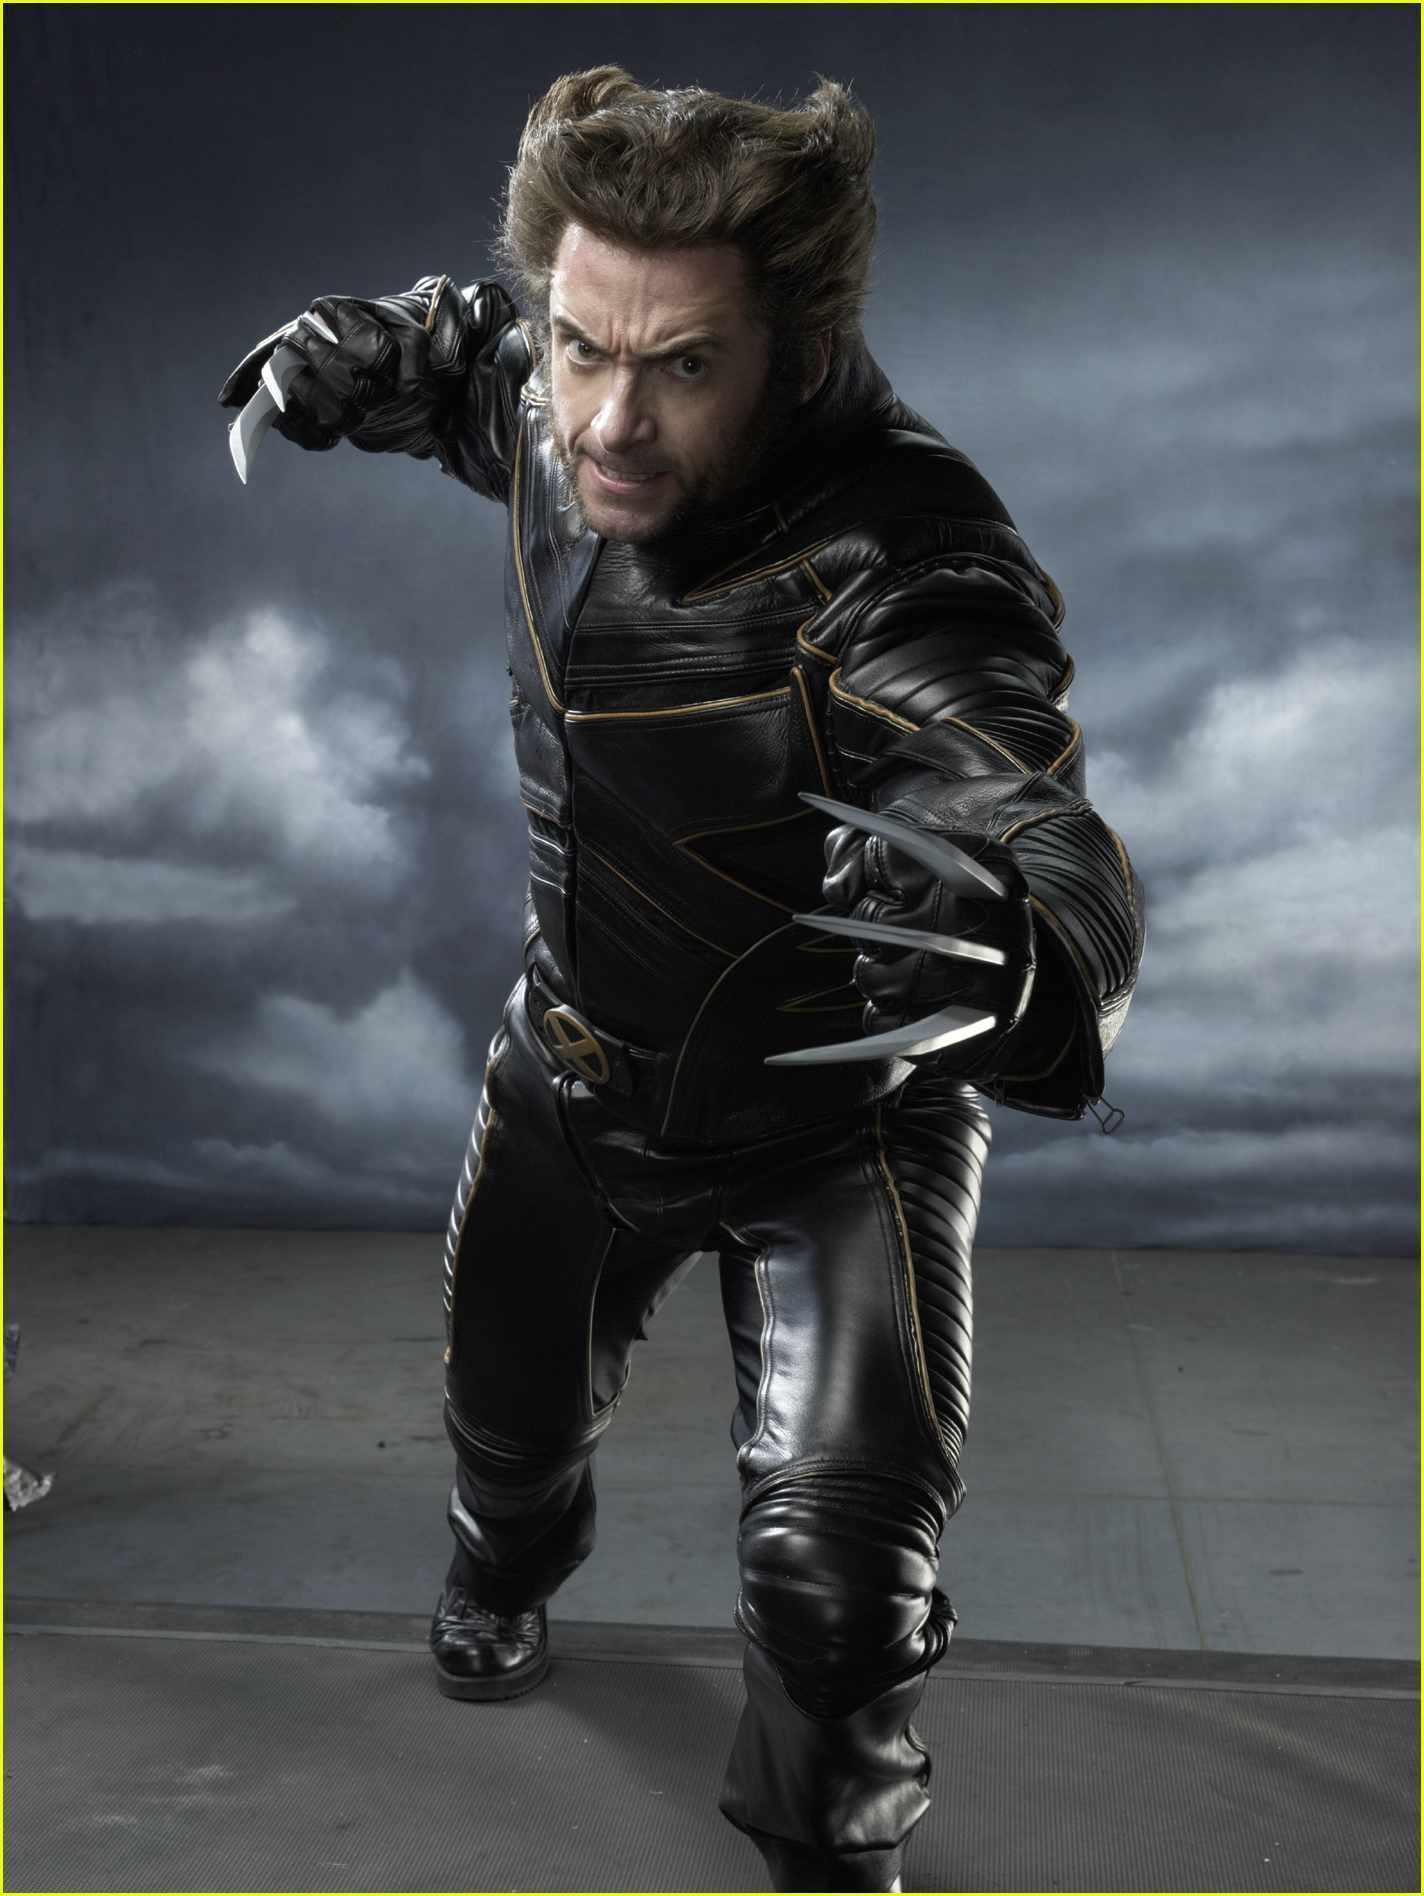 Wolverine - X-men THE MOVIE Foto (20) - Fanpop